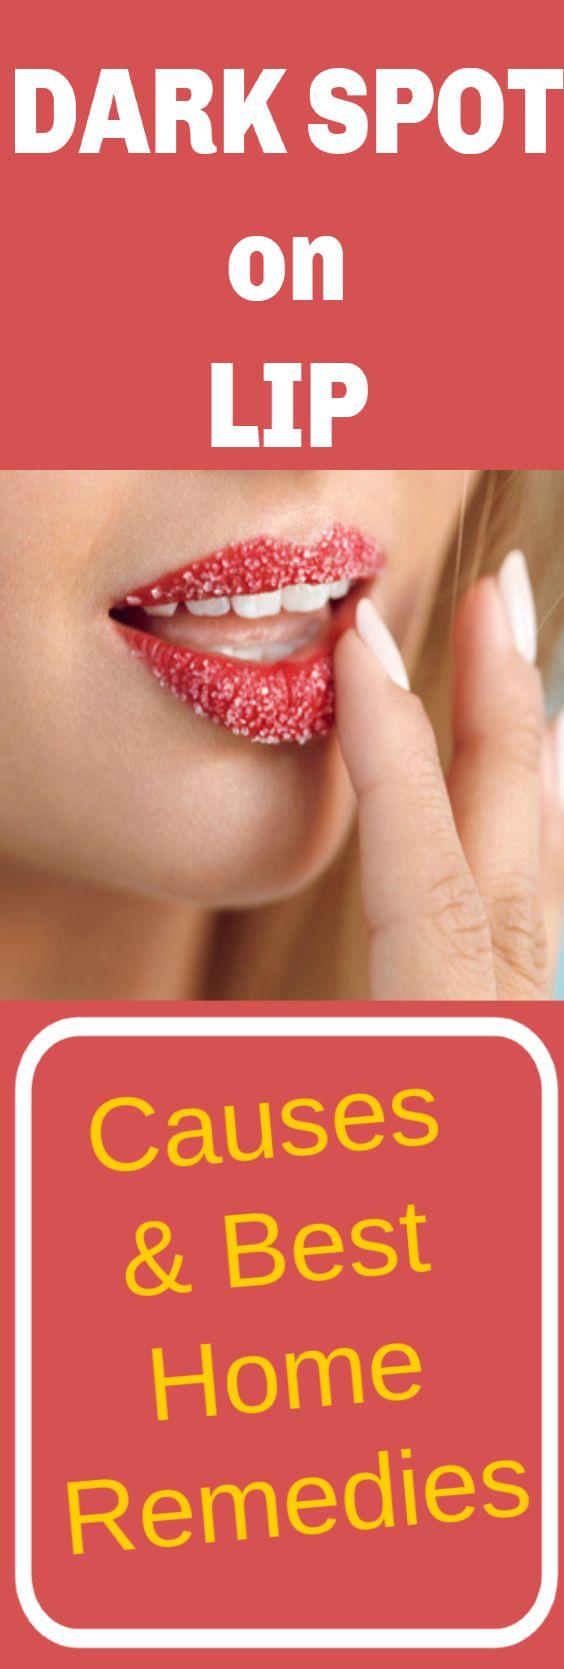 Dark spot on lip – Best Home Remedies To Erase Black Spots On Lips